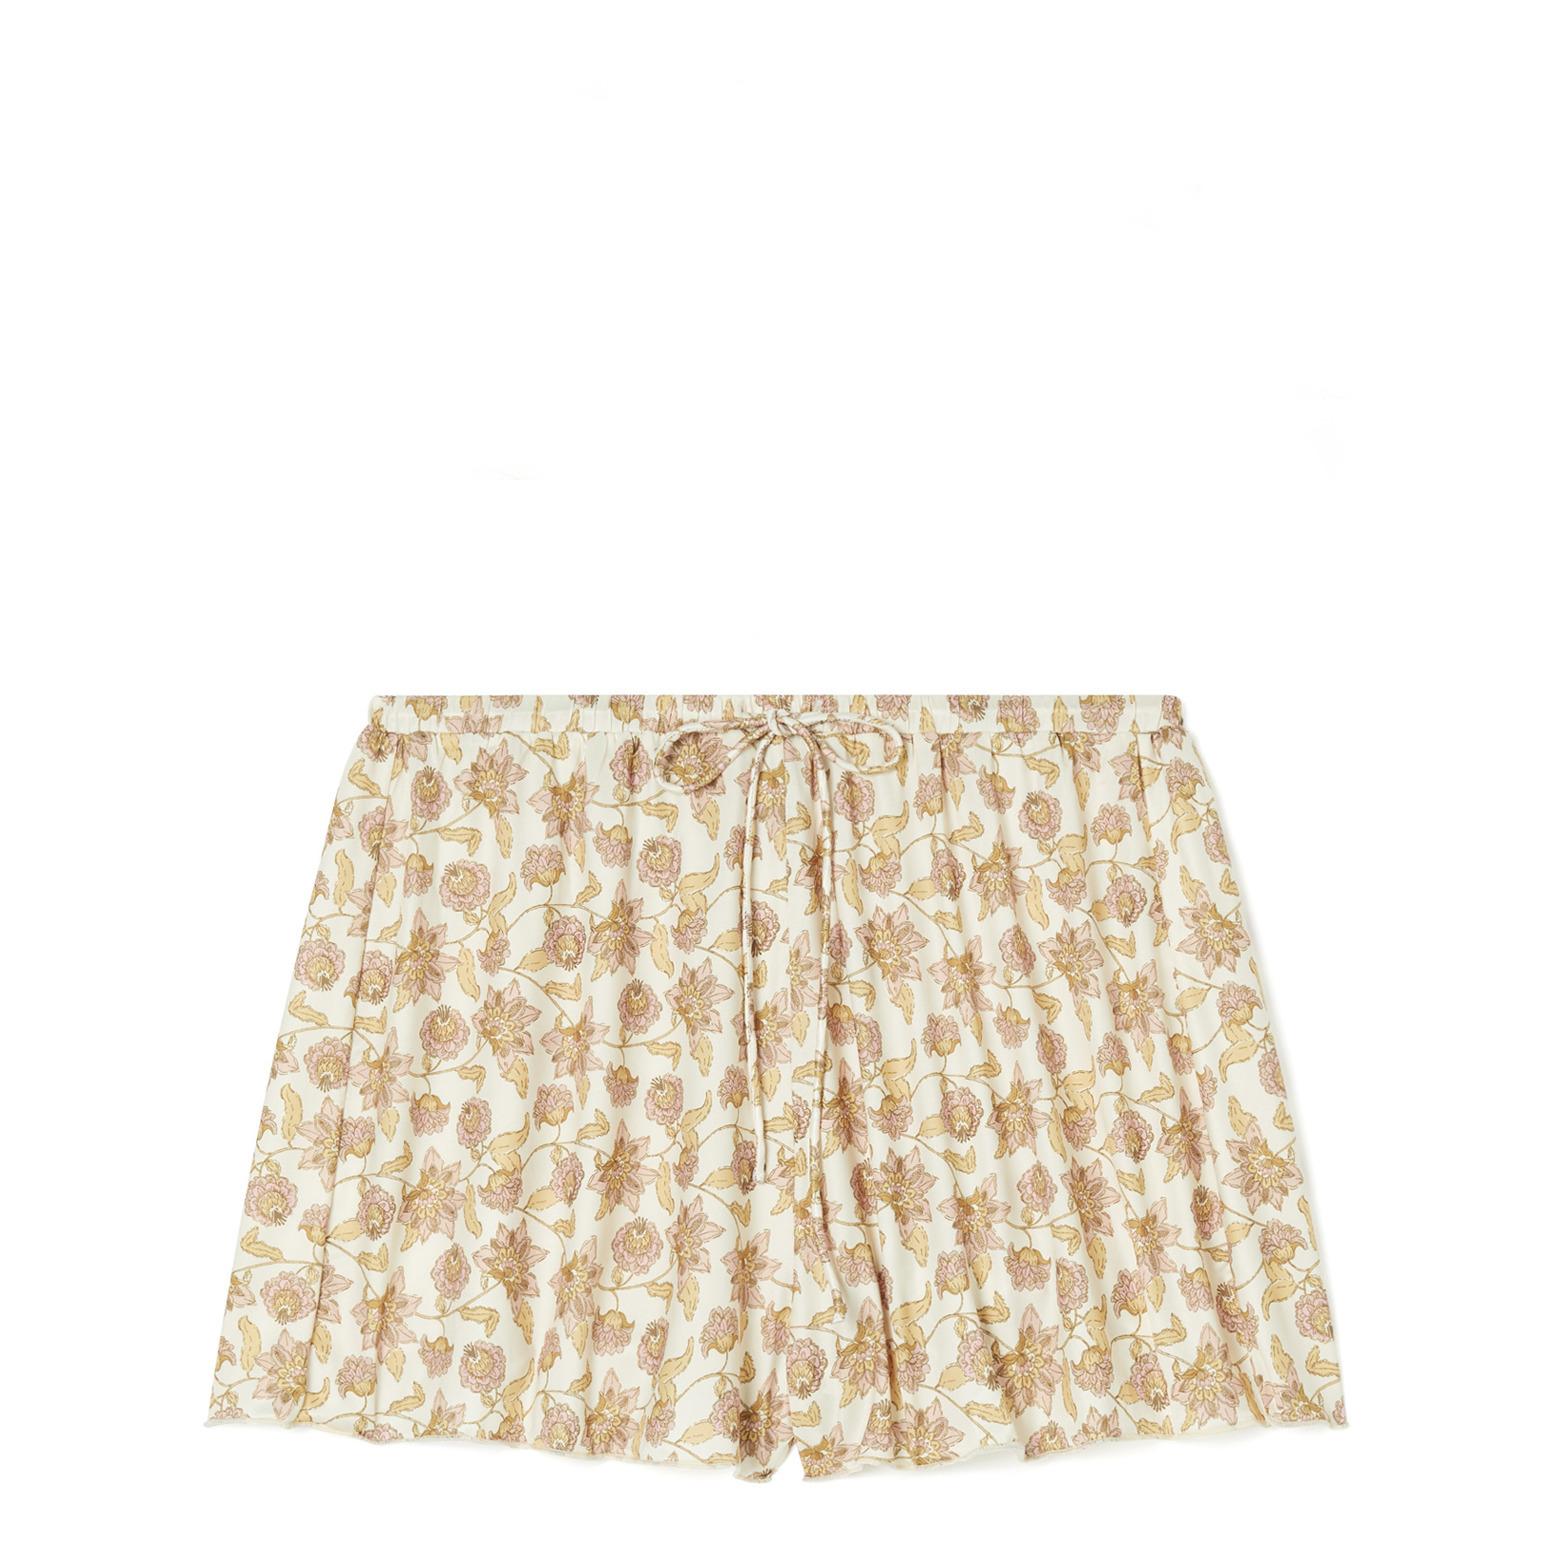 Short de Pyjama Dream - Collection Femme -